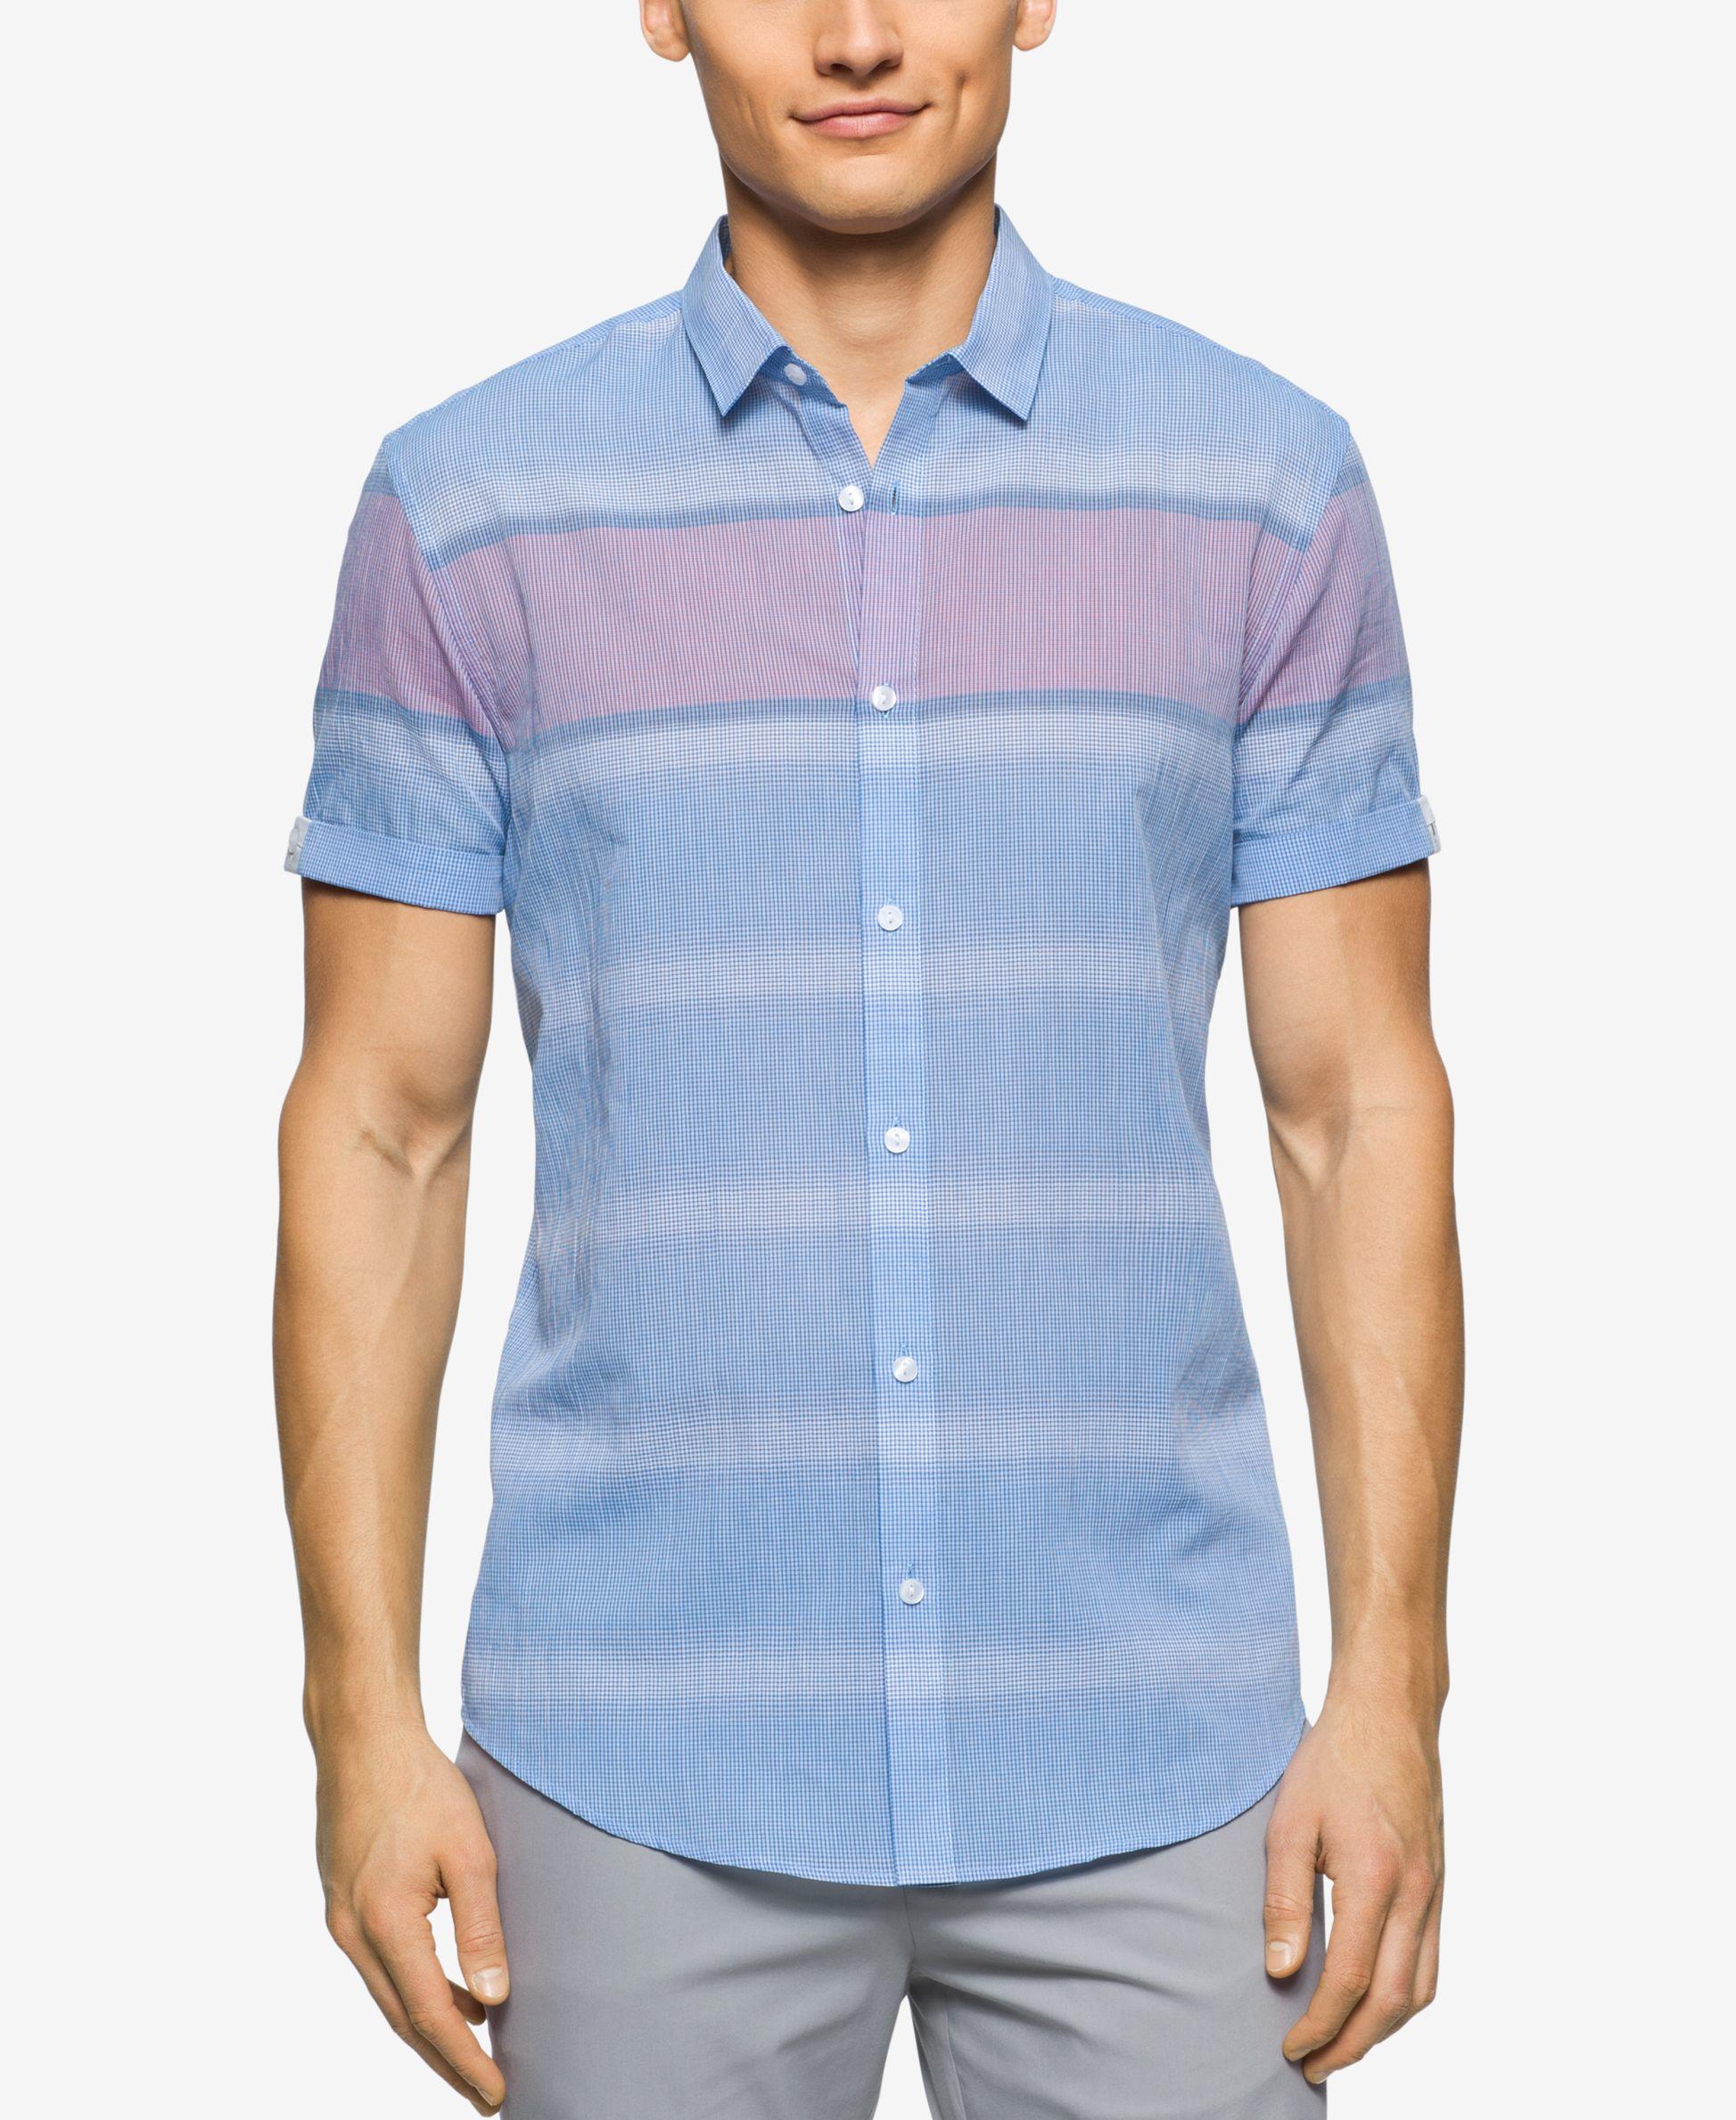 Calvin klein men 39 s short sleeve horizontal striped shirt for Horizontal striped dress shirts men